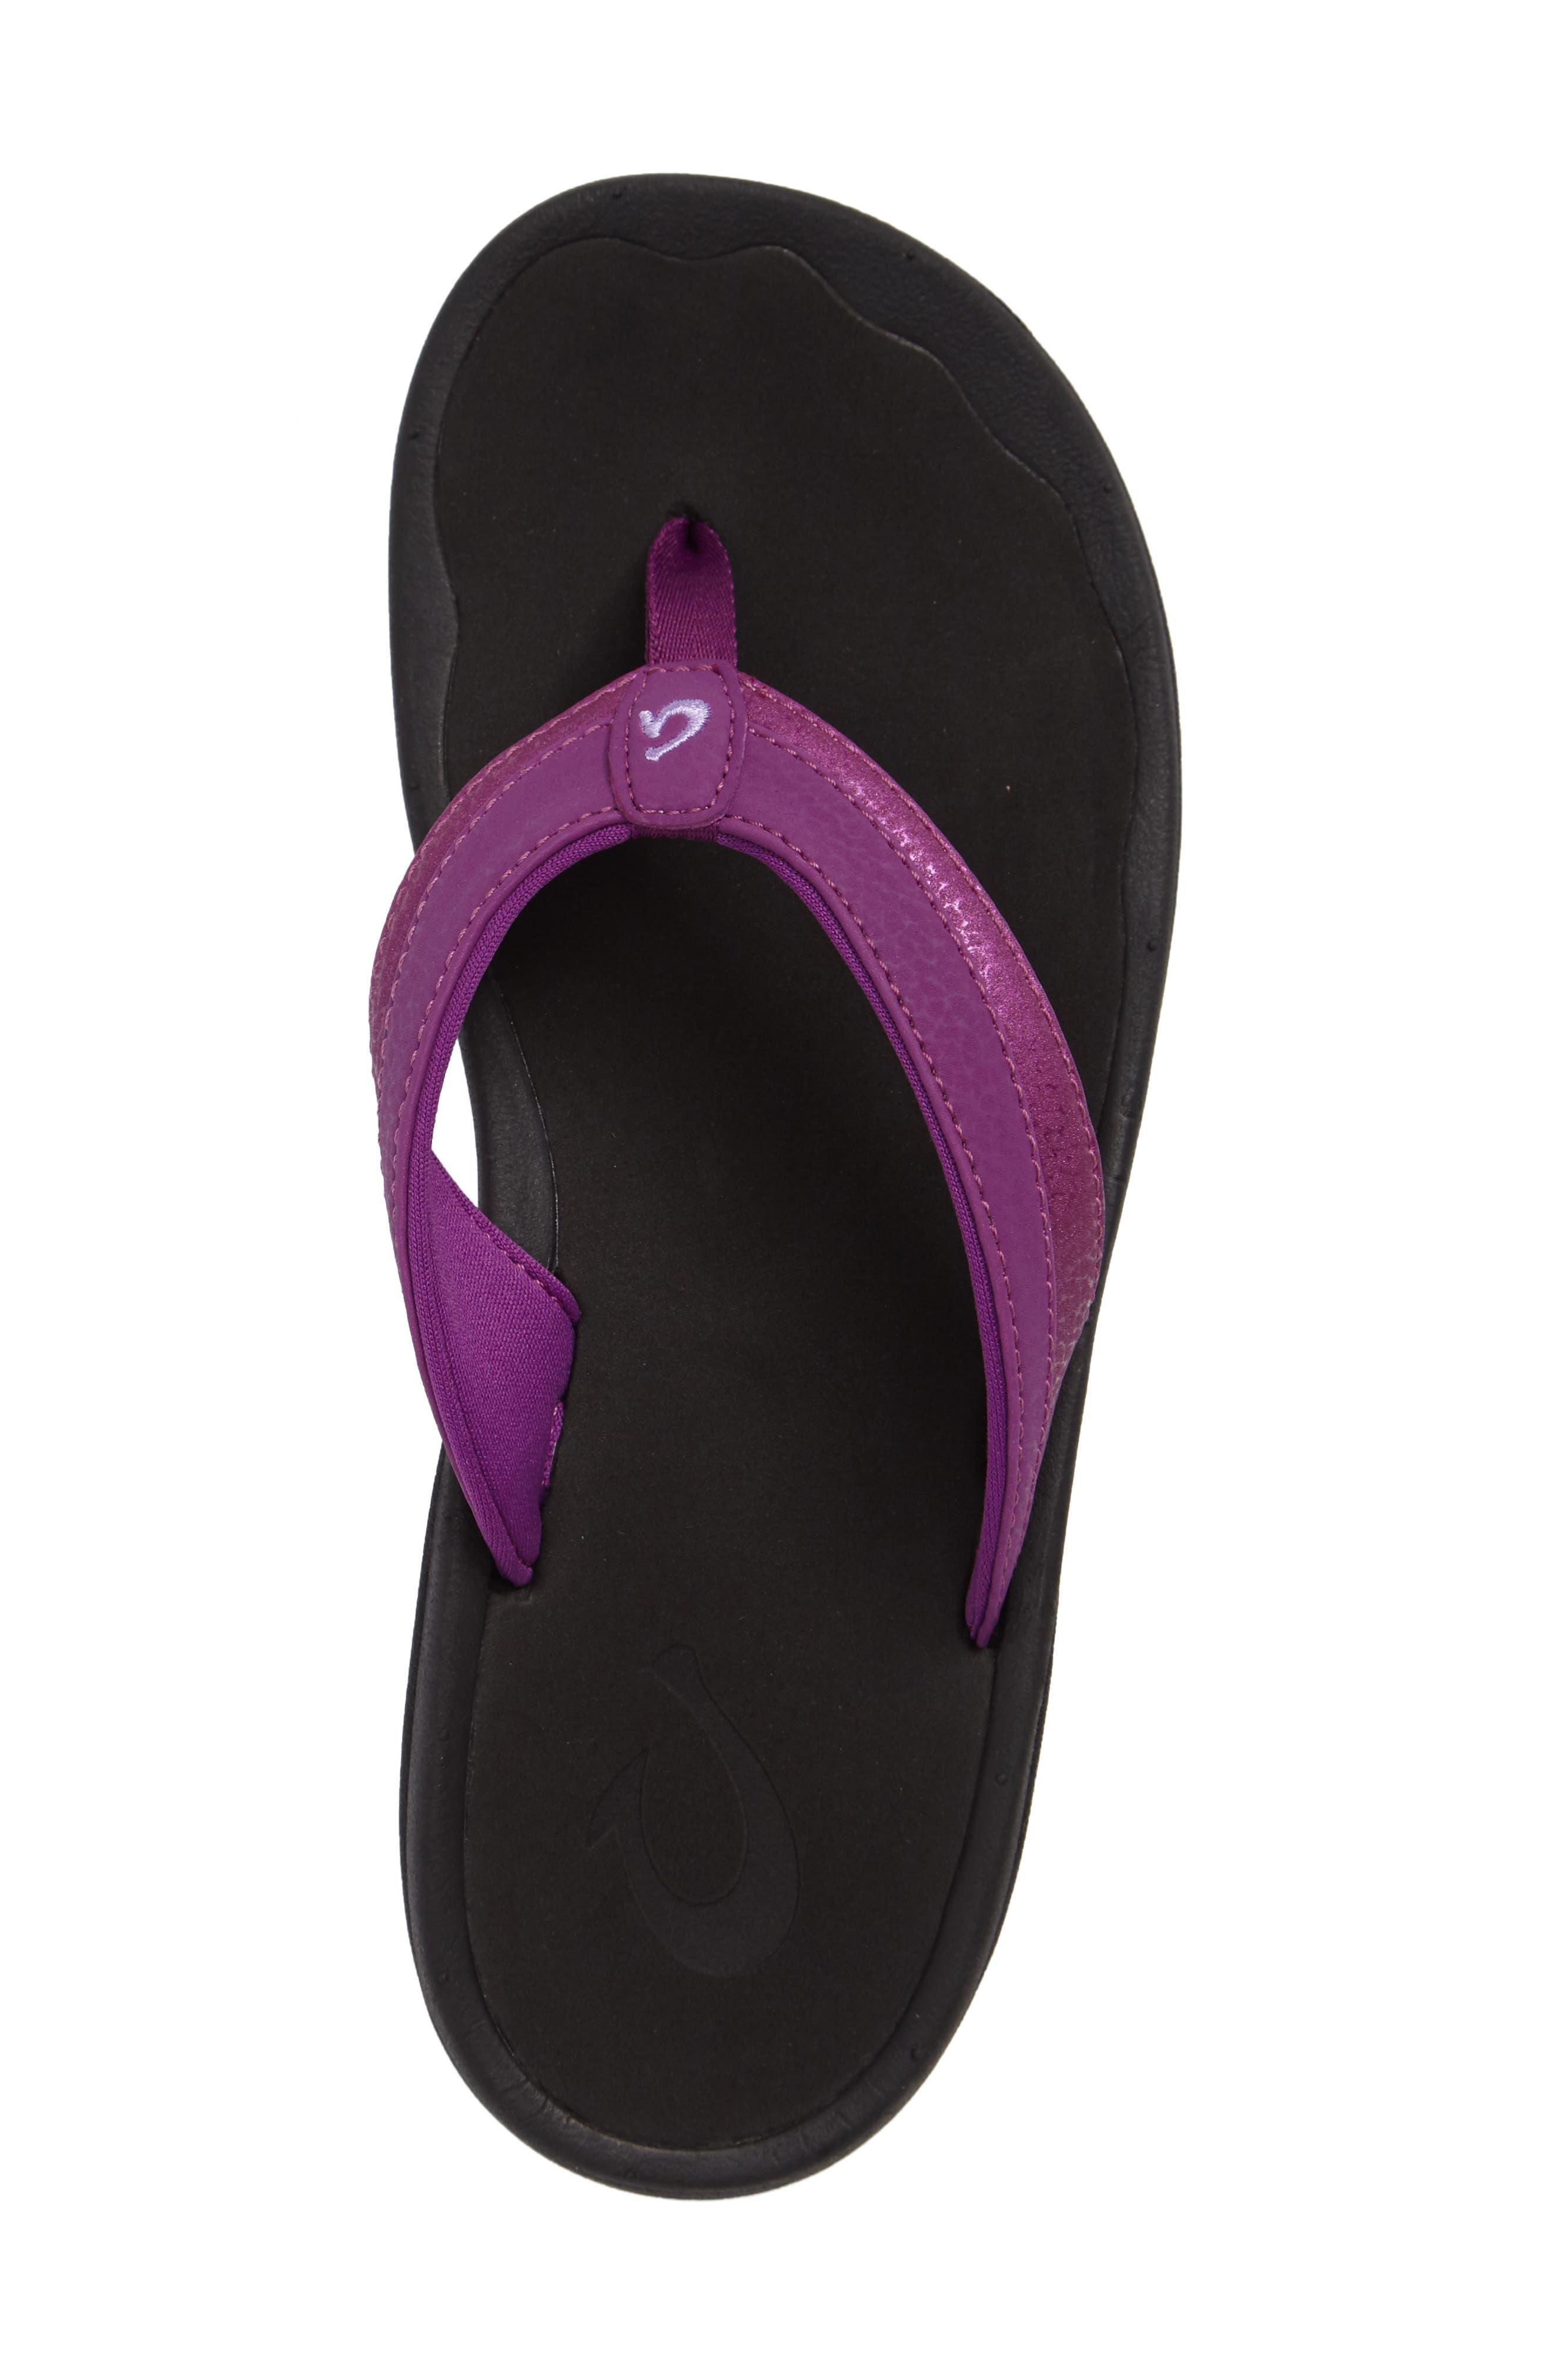 Ohana Sandal,                             Alternate thumbnail 3, color,                             Dahlia/ Black Faux Leather